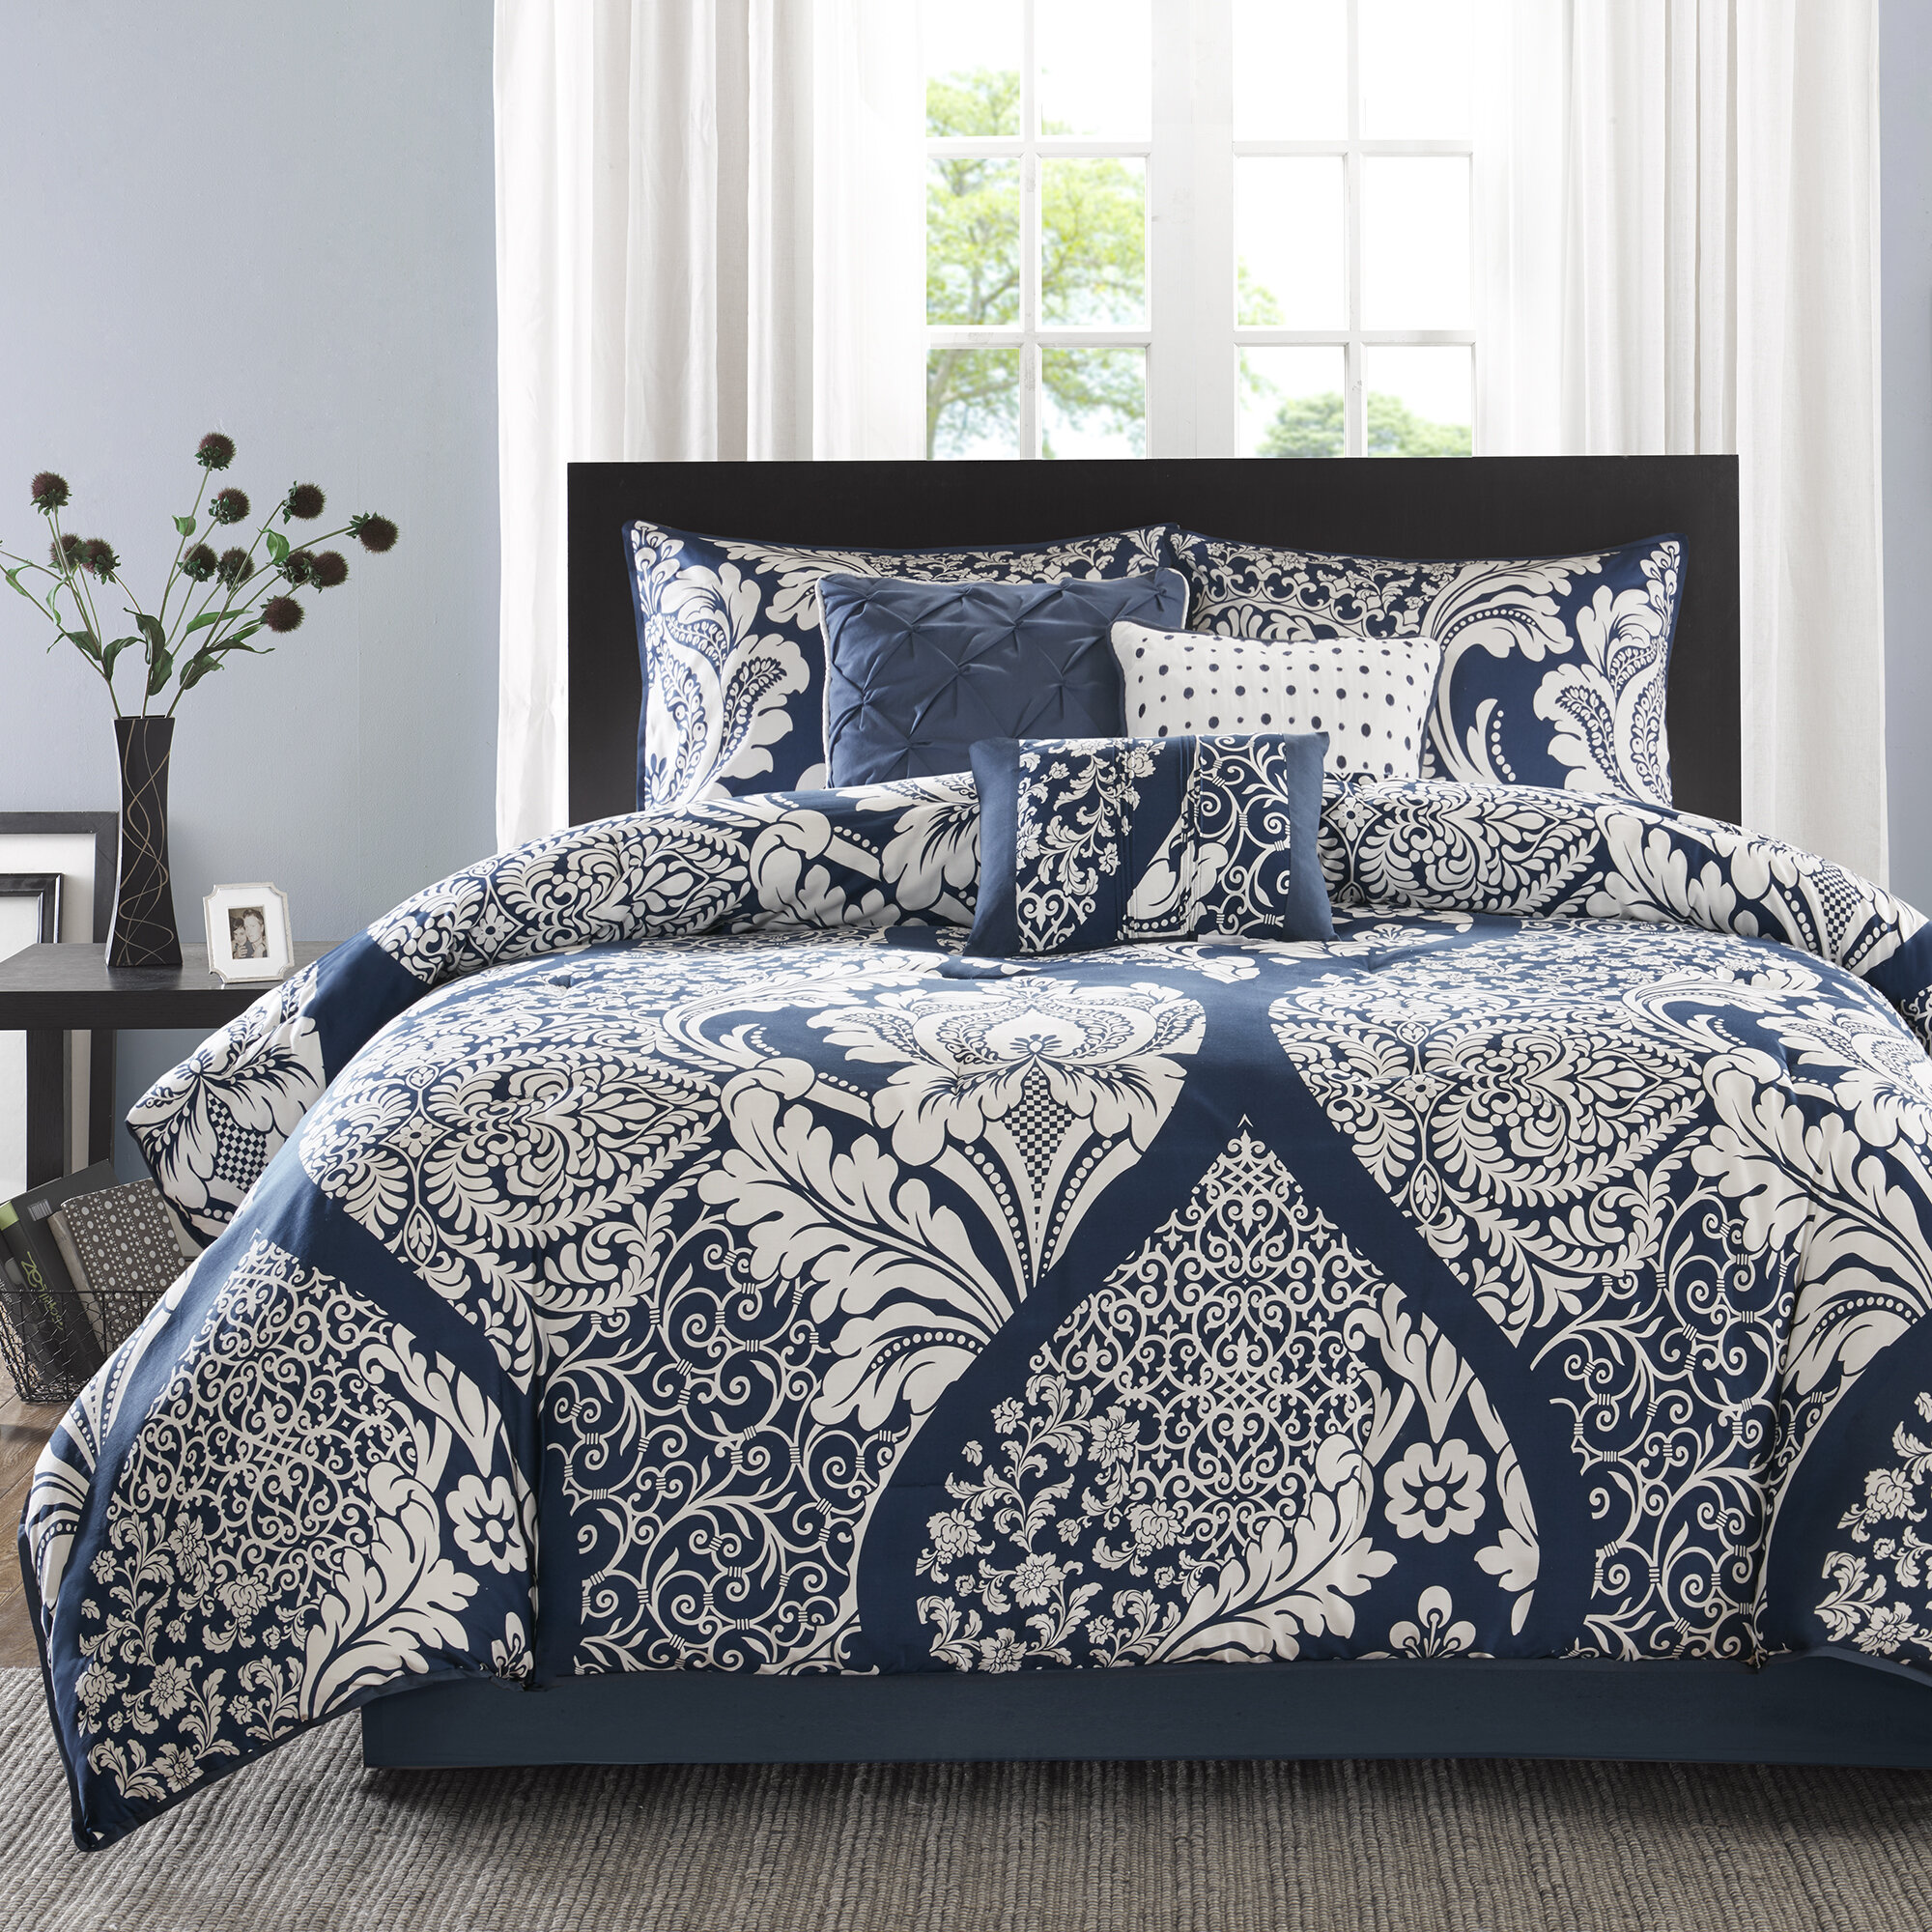 Comforter Sets.Milltown 7 Piece Comforter Set